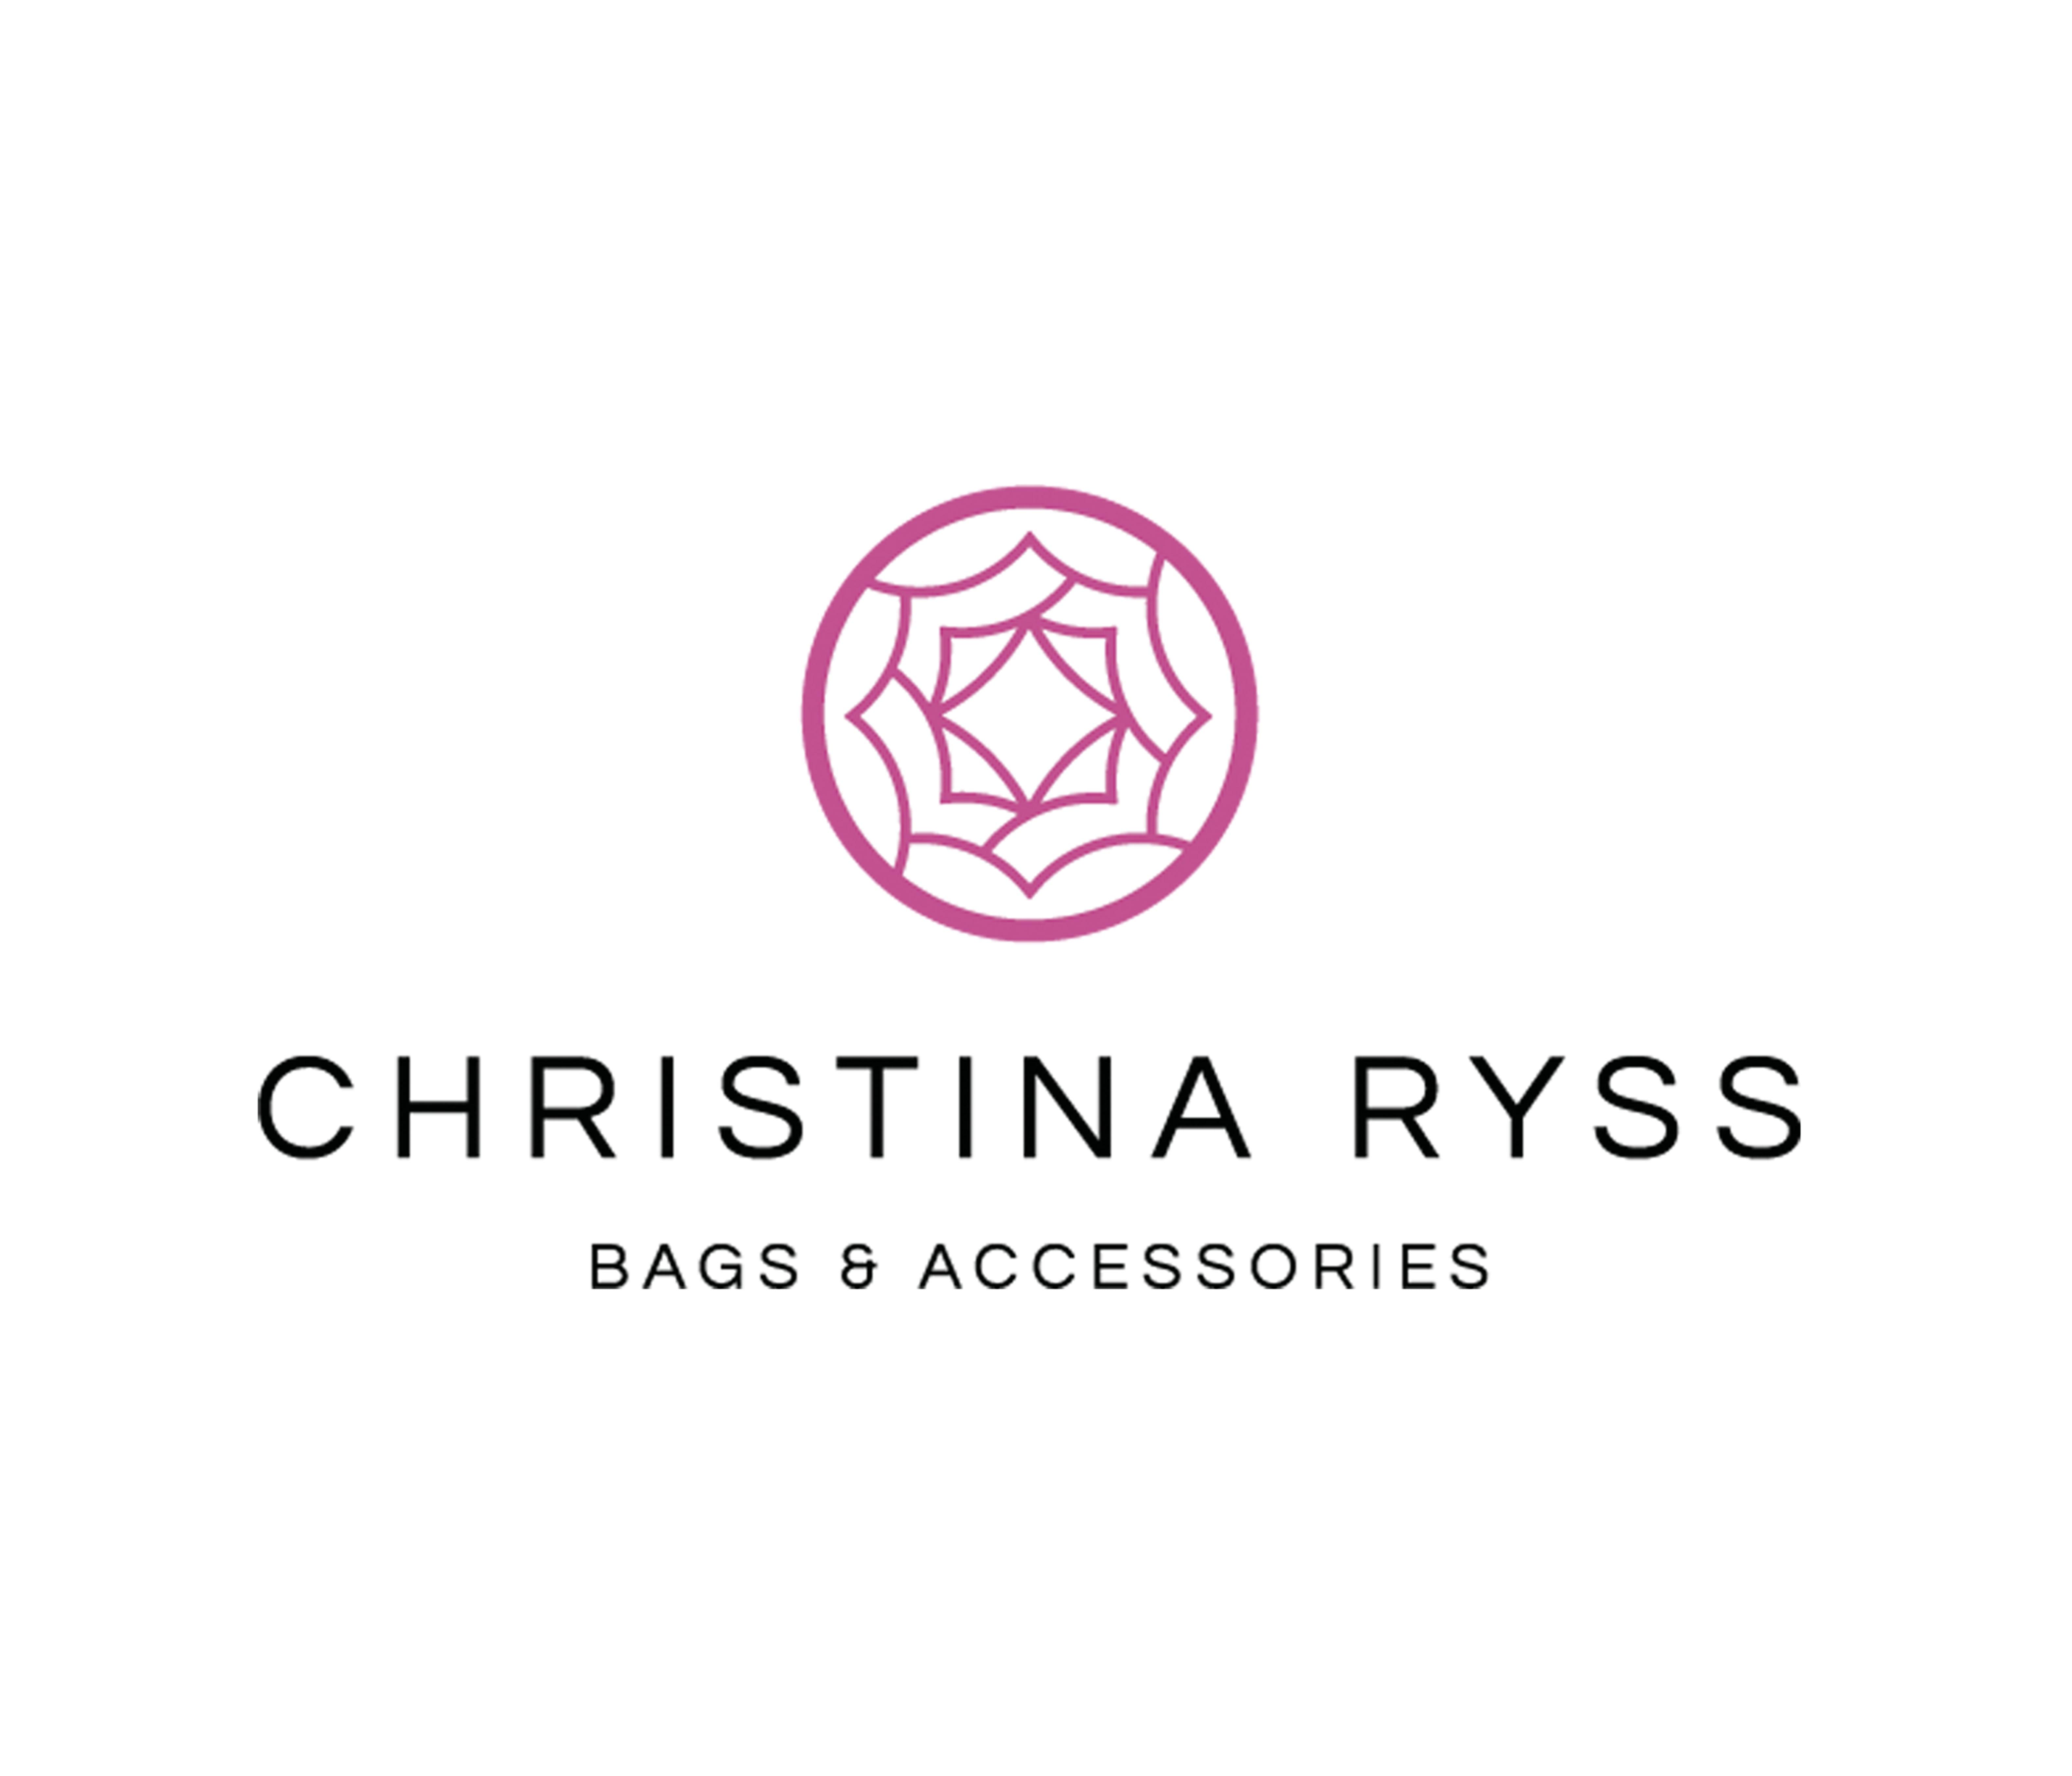 Christina Ryss